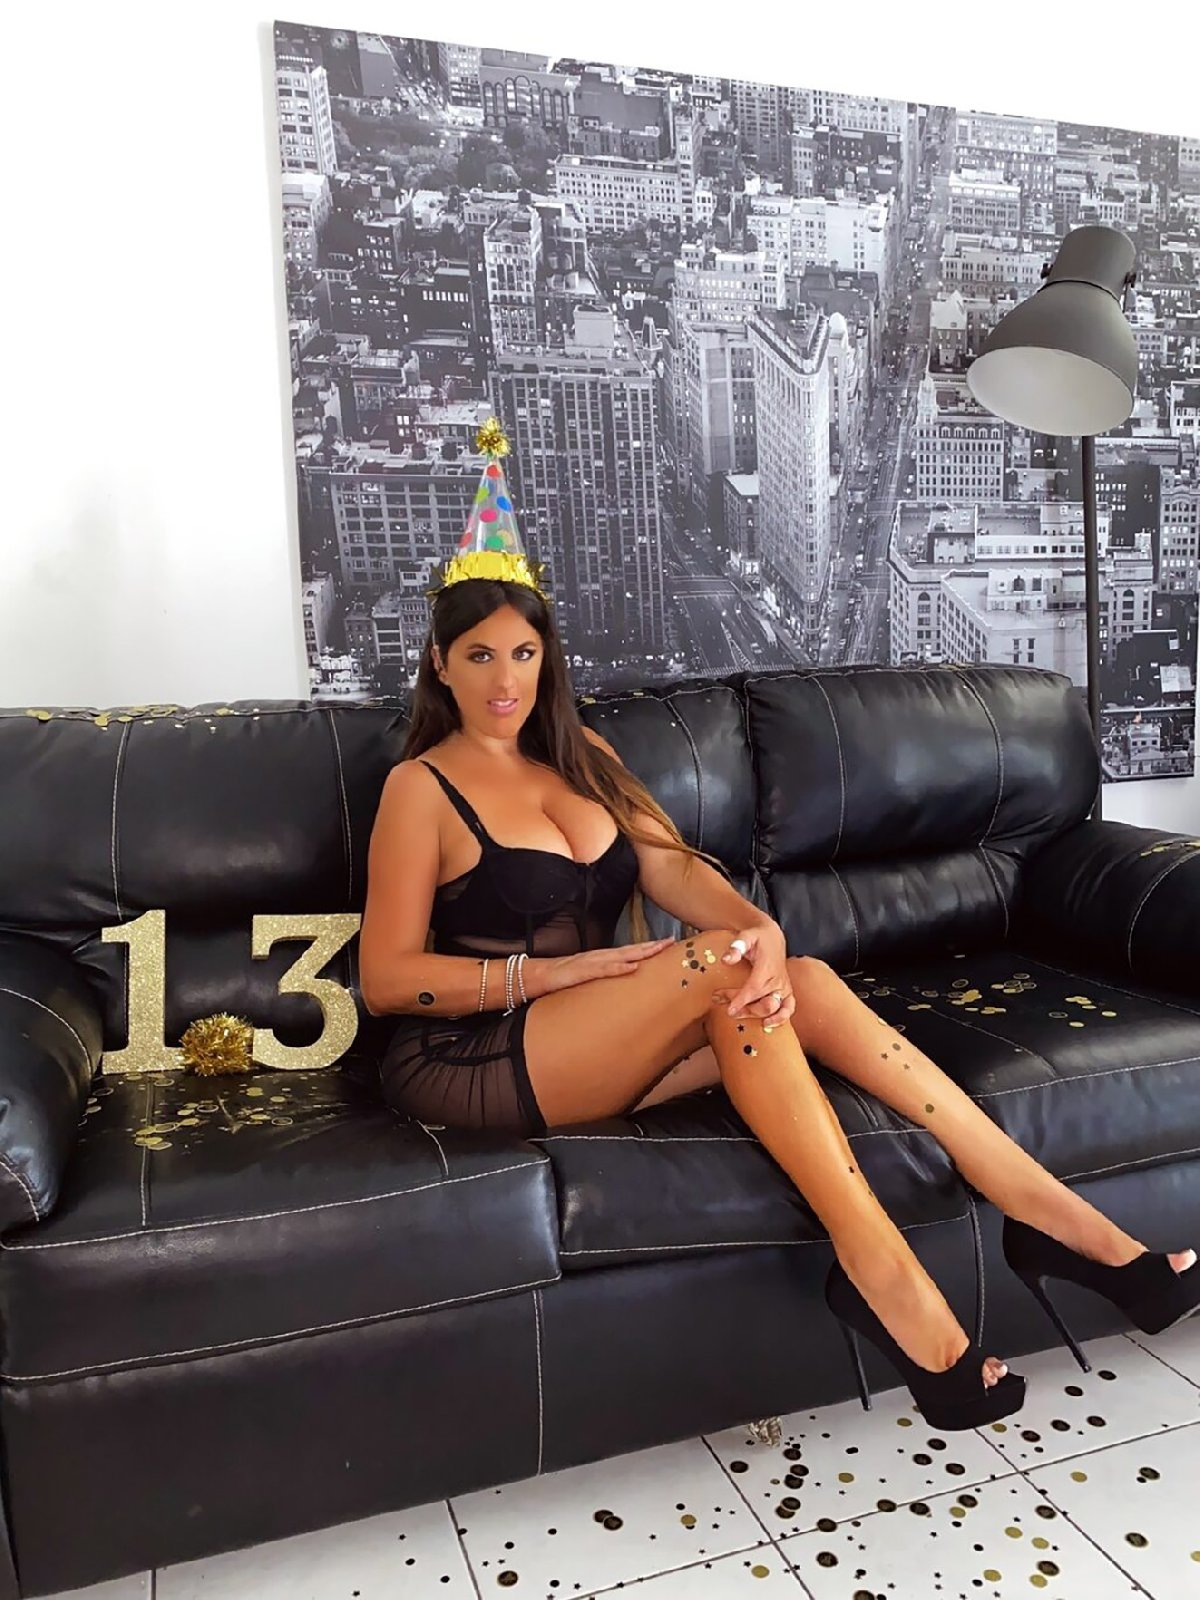 İtalyan model Claudia Romani'den 1.3 milyon takipçi kutlaması